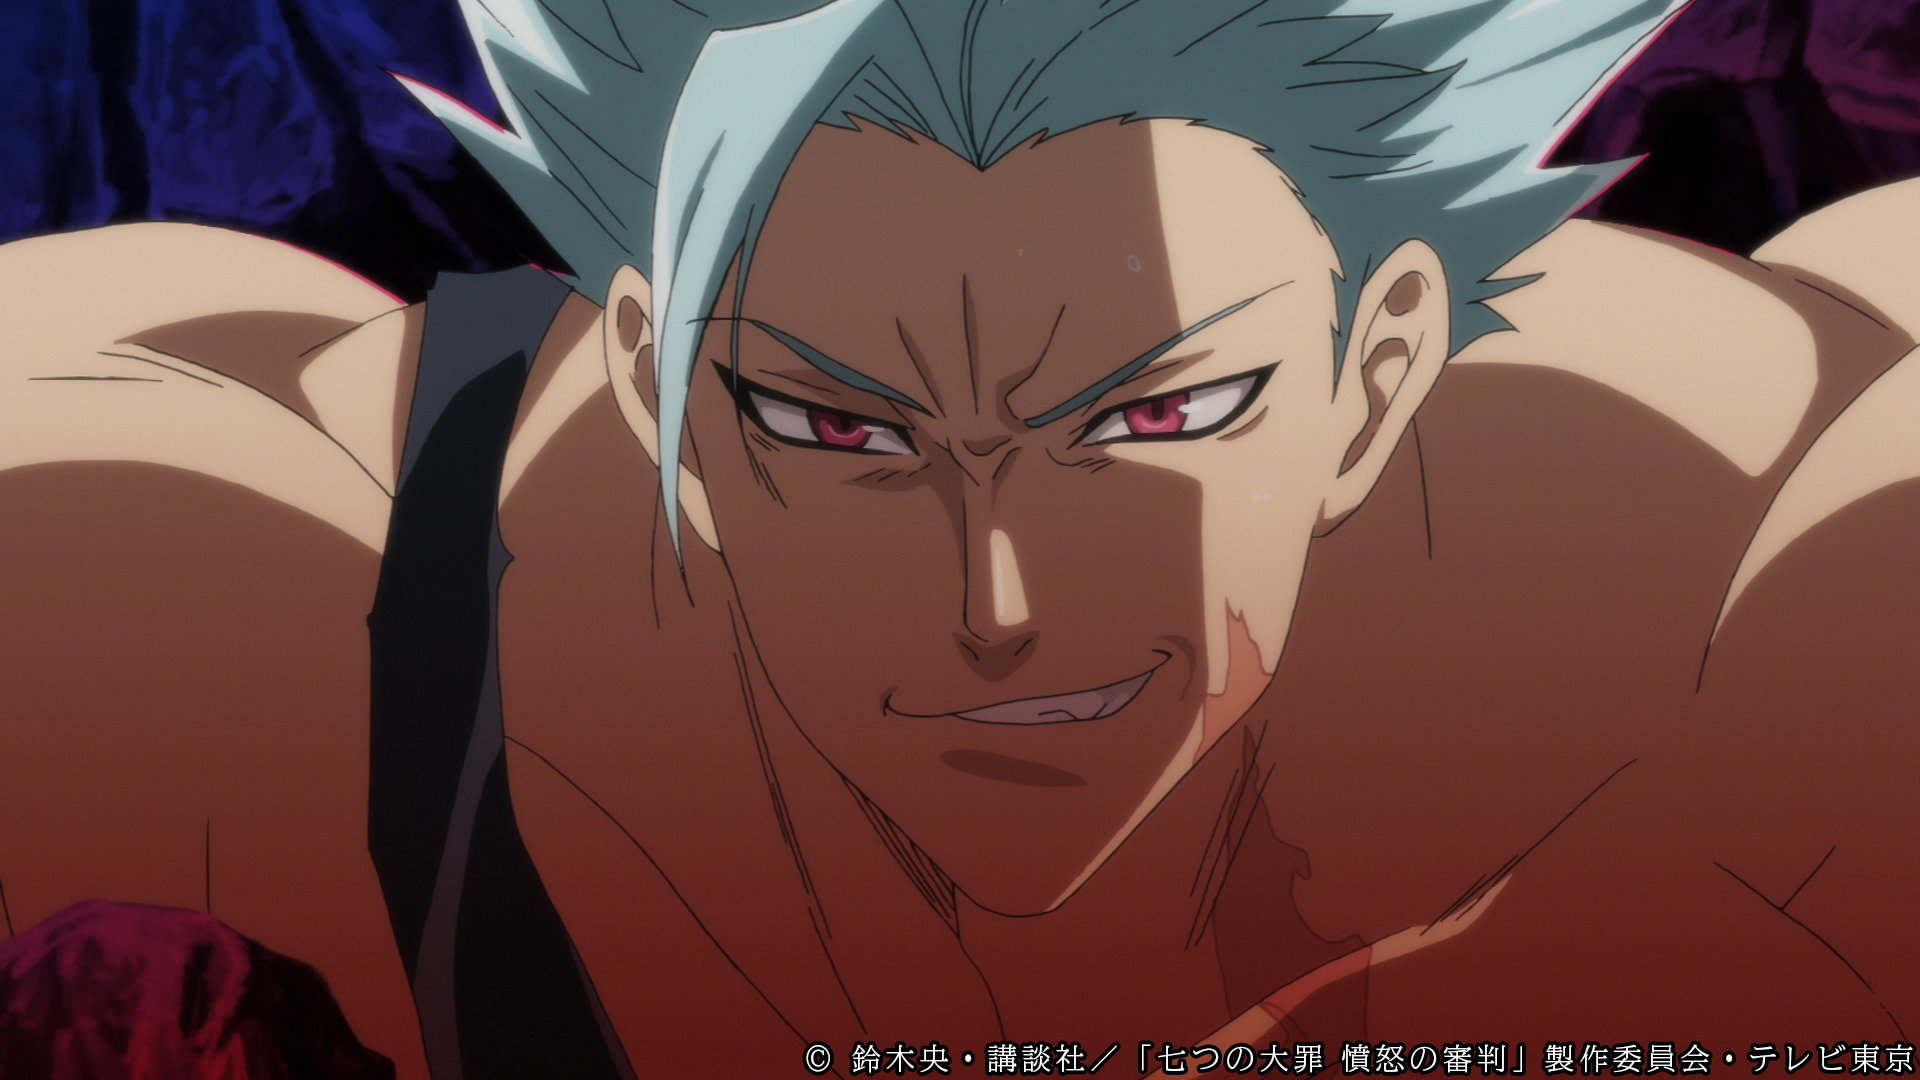 TVアニメ「七つの大罪 憤怒の審判」第1話「煉獄より」あらすじ&先行カット到着!シリーズ最終章いよいよ開幕